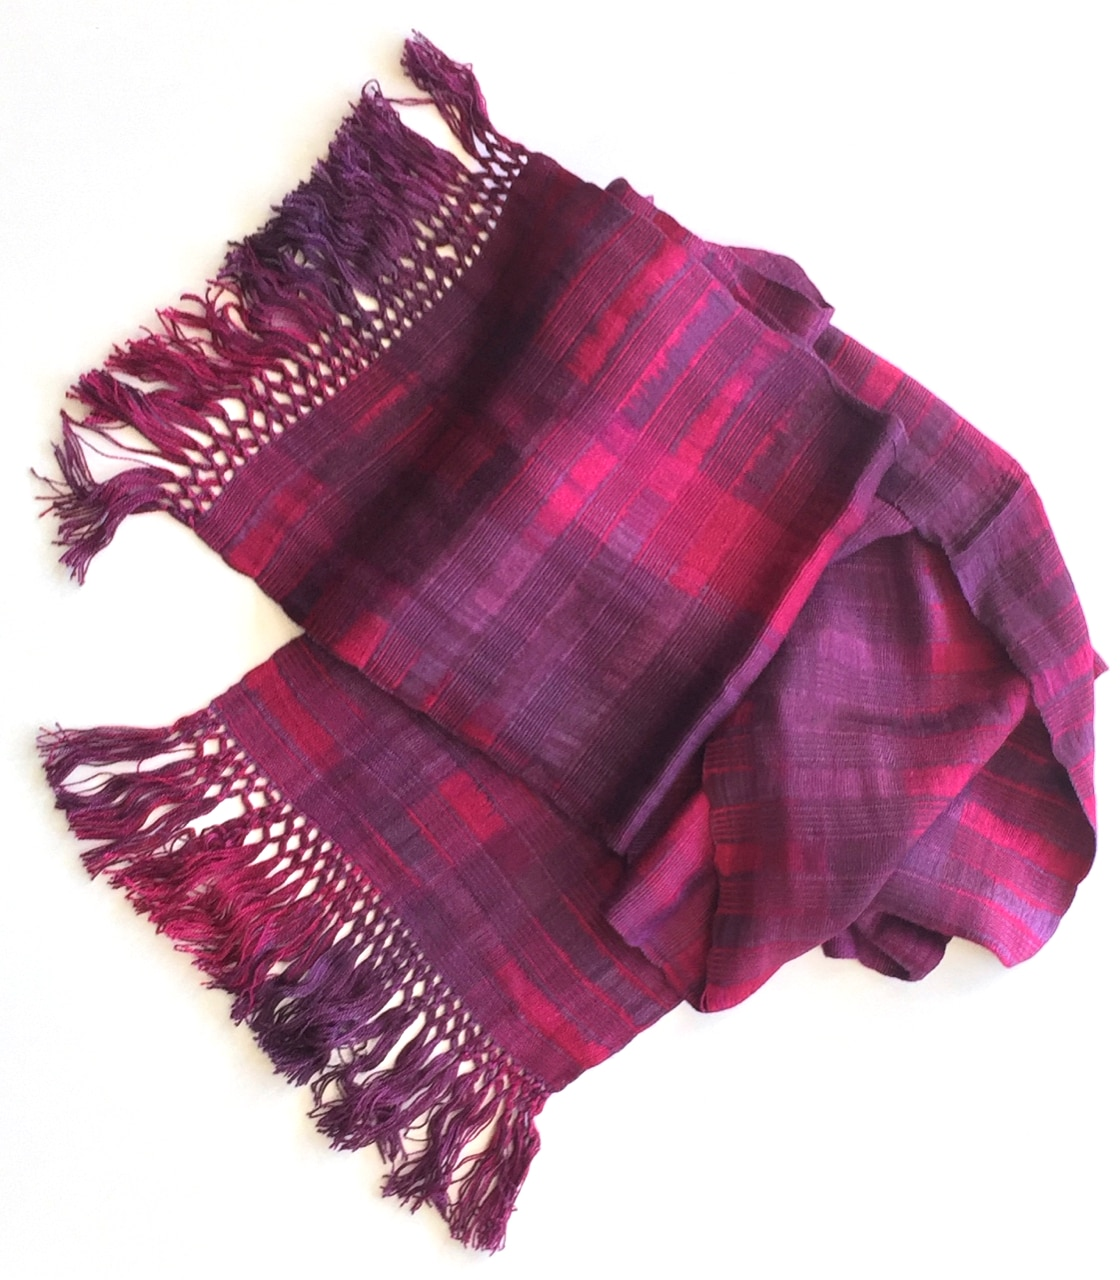 Magenta, Purple - Lightweight Bamboo Open-Weave Handwoven Scarf 8 x 68